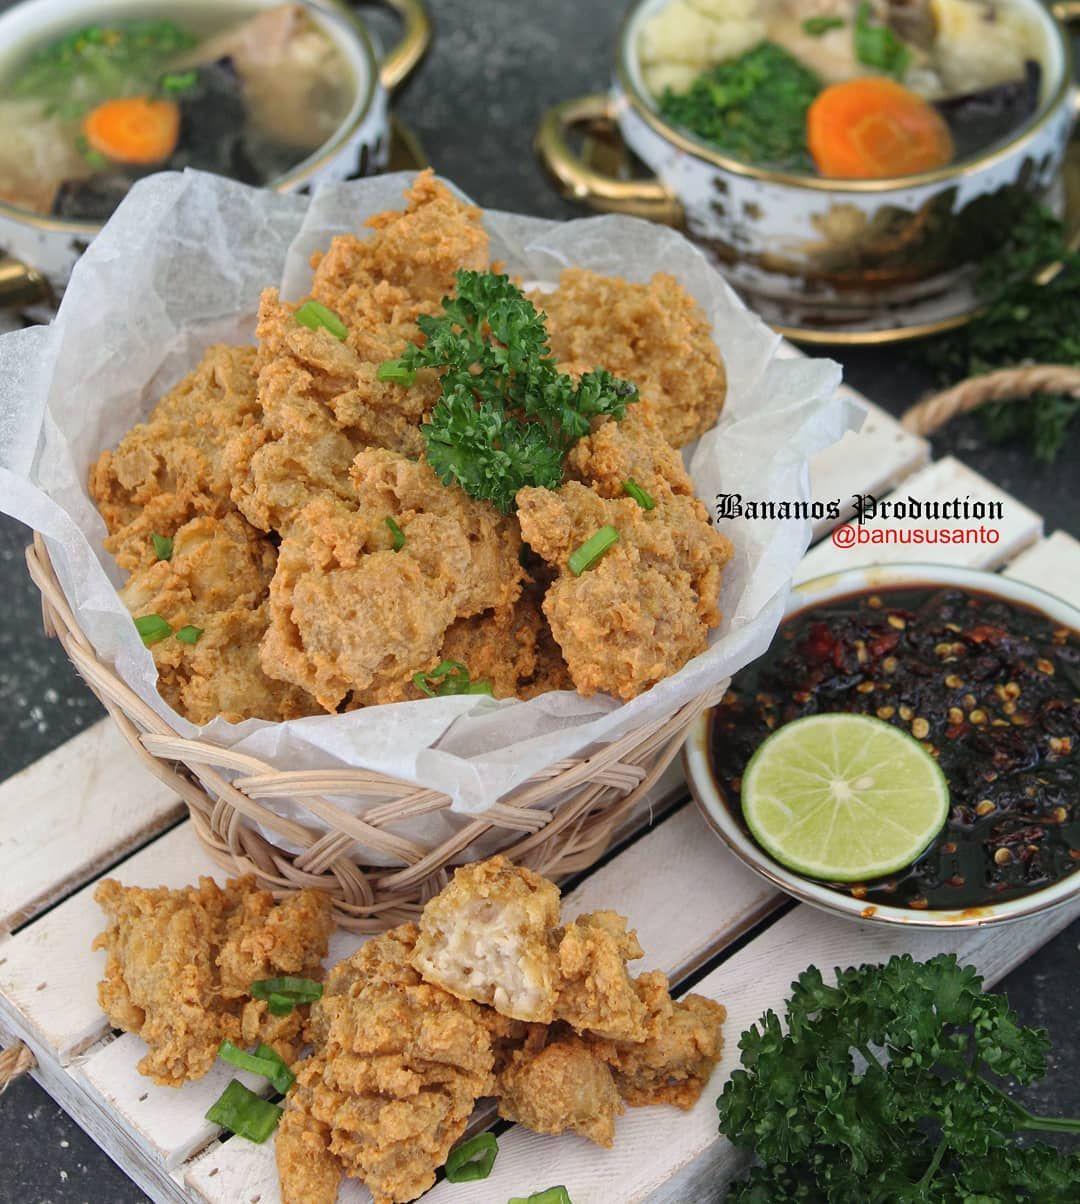 Udahan Dulu Pesta Dagingnya Saatnya Makan Yang Ringan Dan Simpel Tapi Juga Ndak Kalah Enak Menu Makan Siang Sebelum Berang Masakan Resep Masakan Sehat Resep